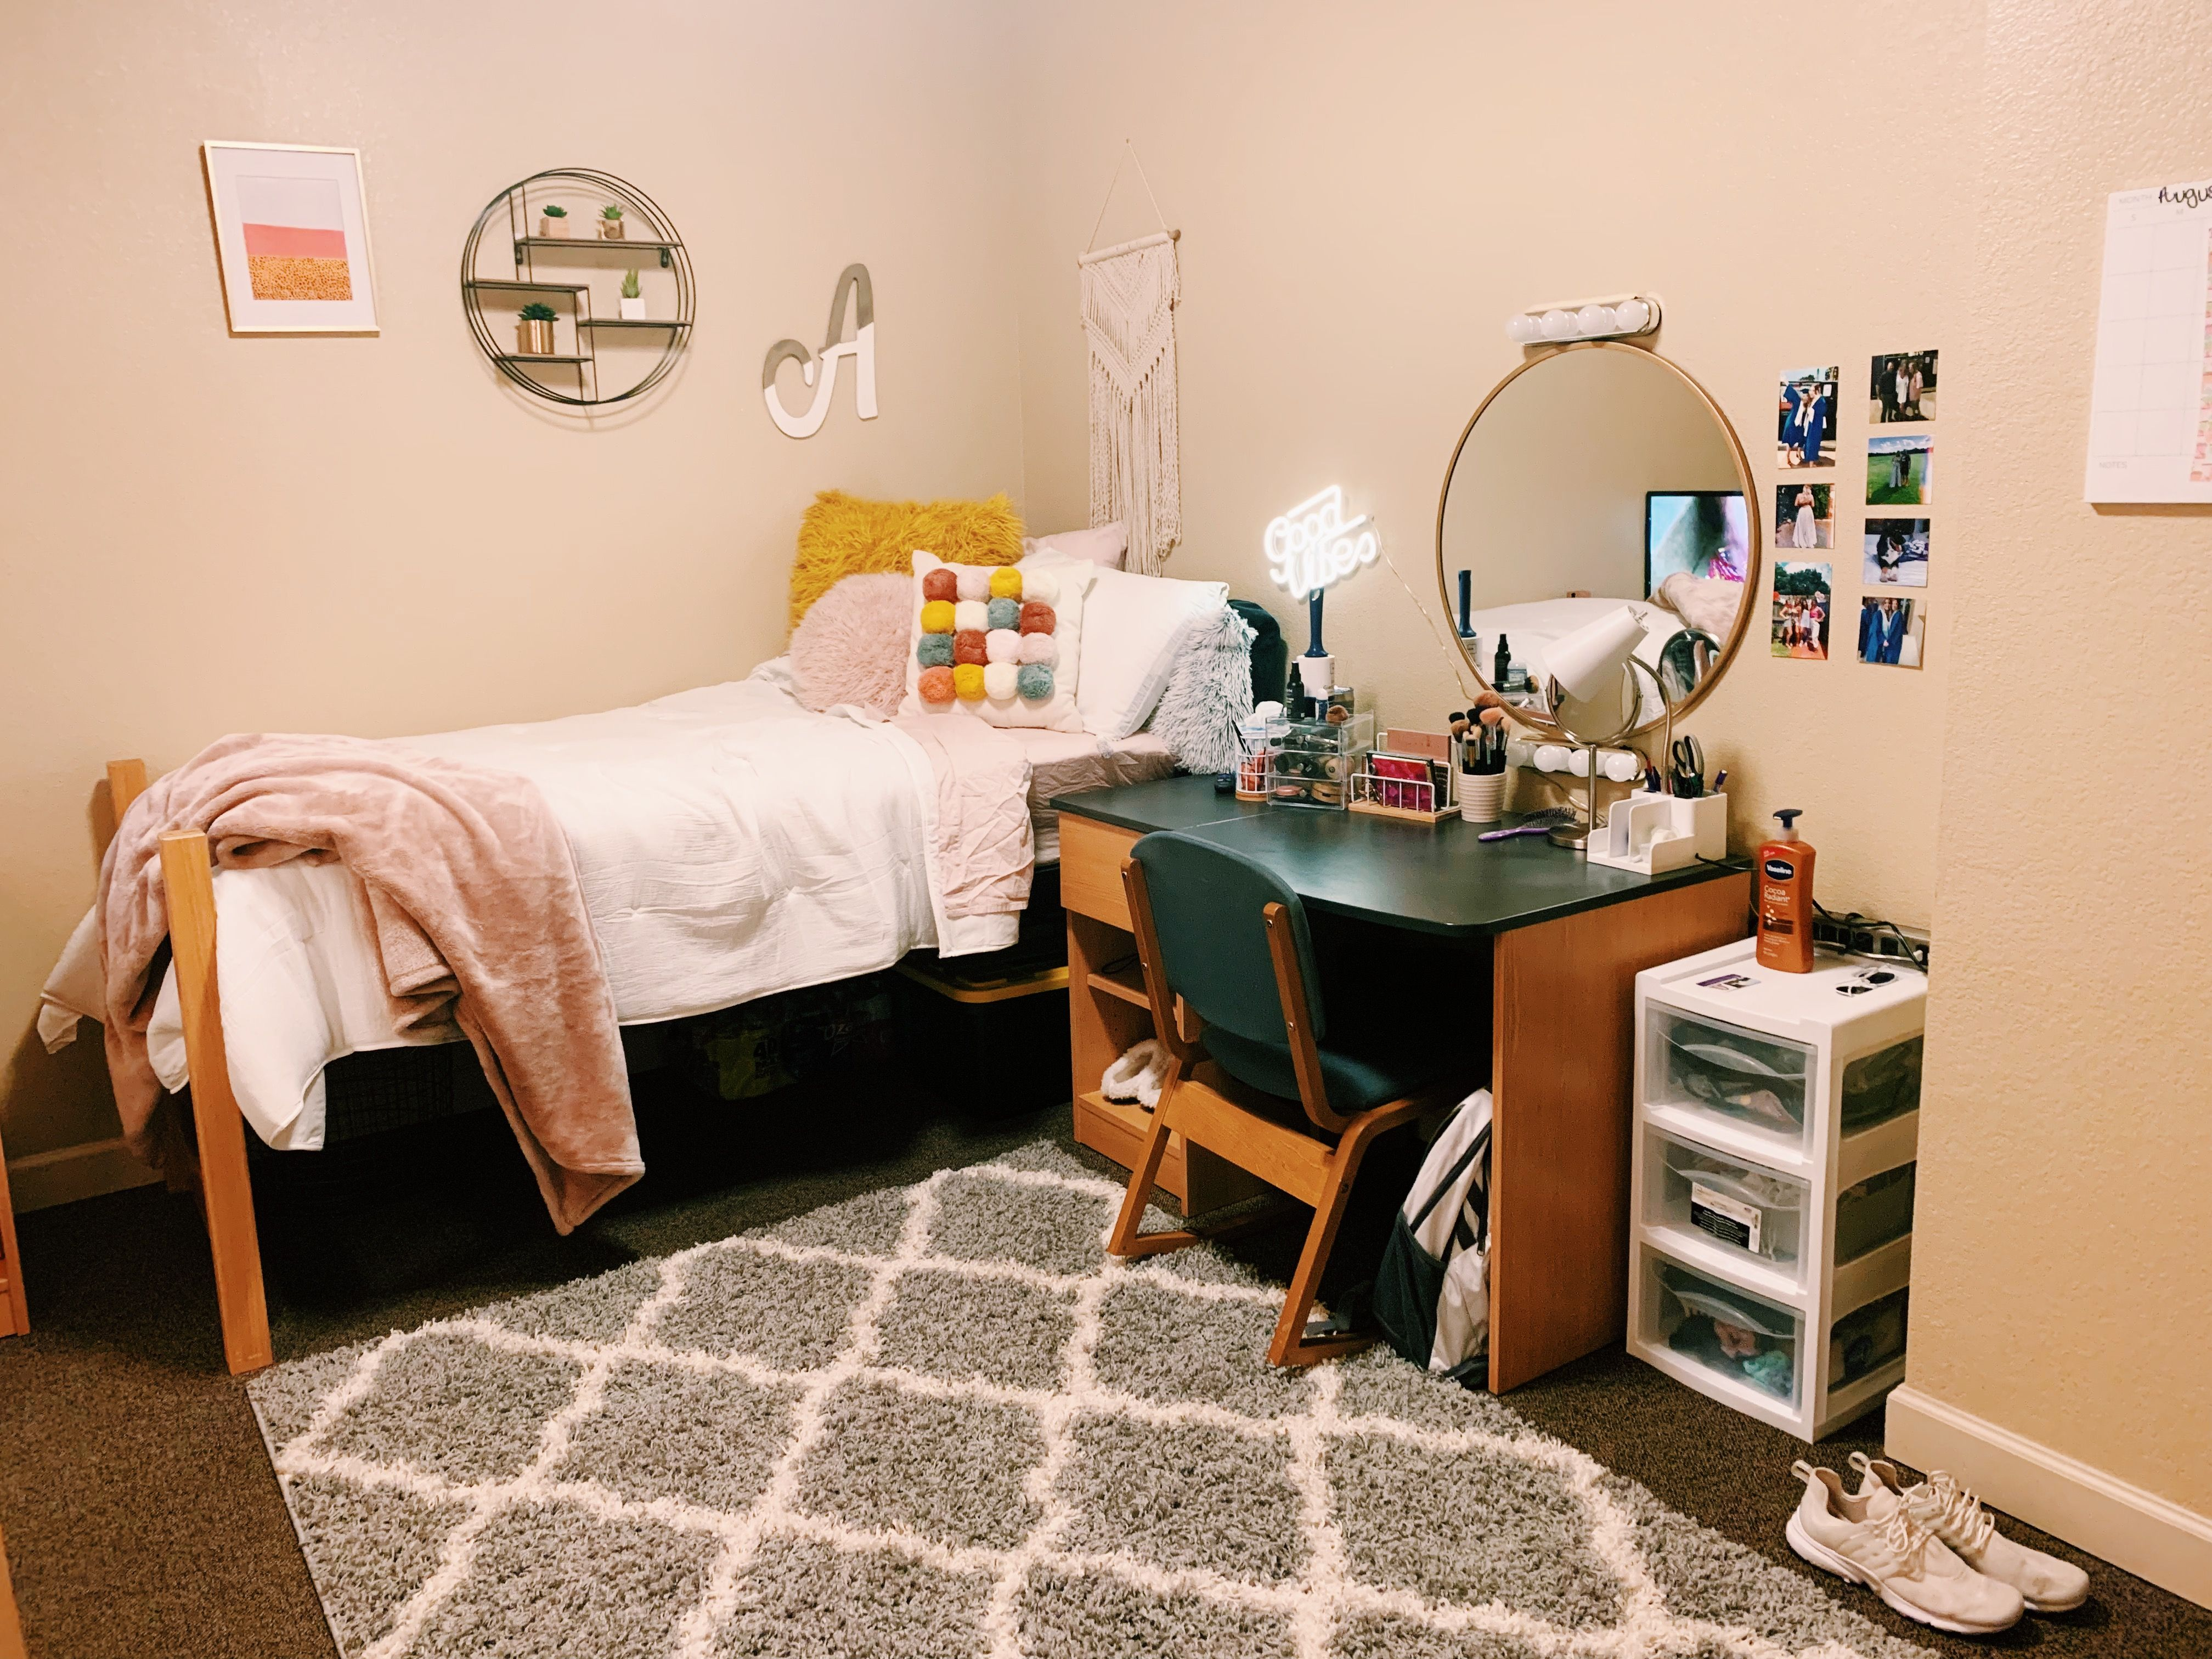 Dorm Room Tarleton State University University Dorms Dorm Room Dorm